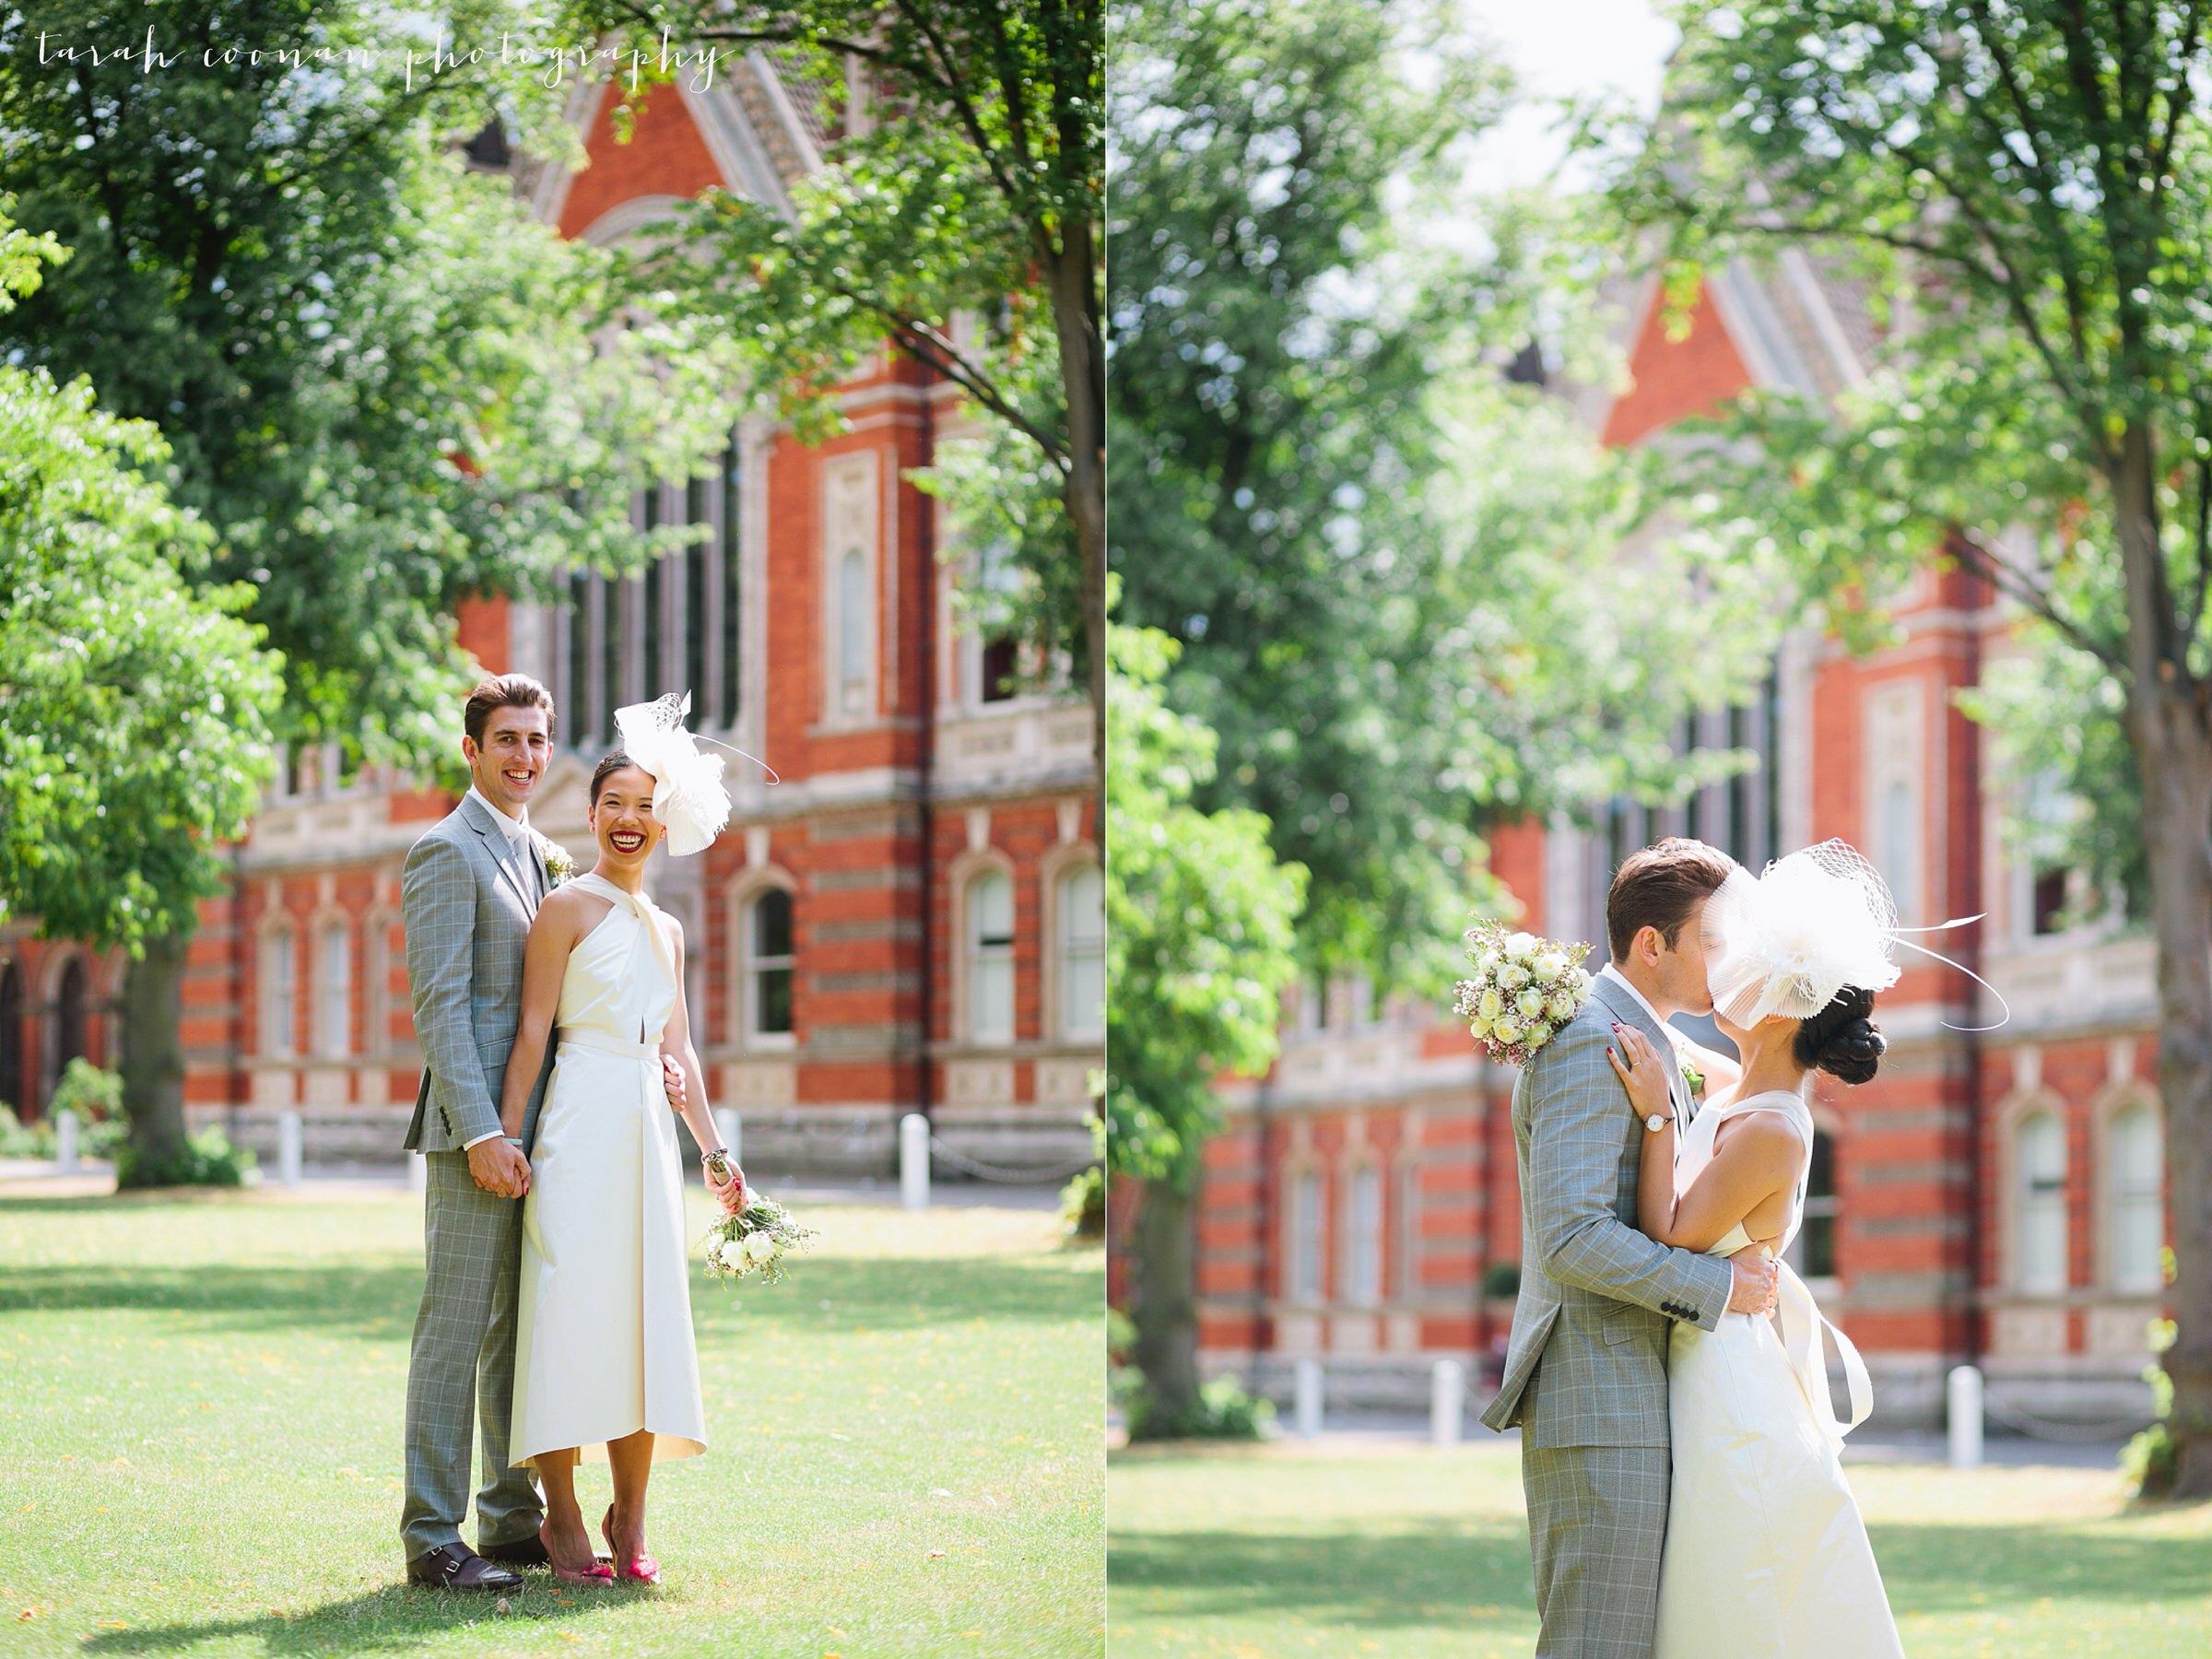 Dulwich College wedding - Mark & Trang